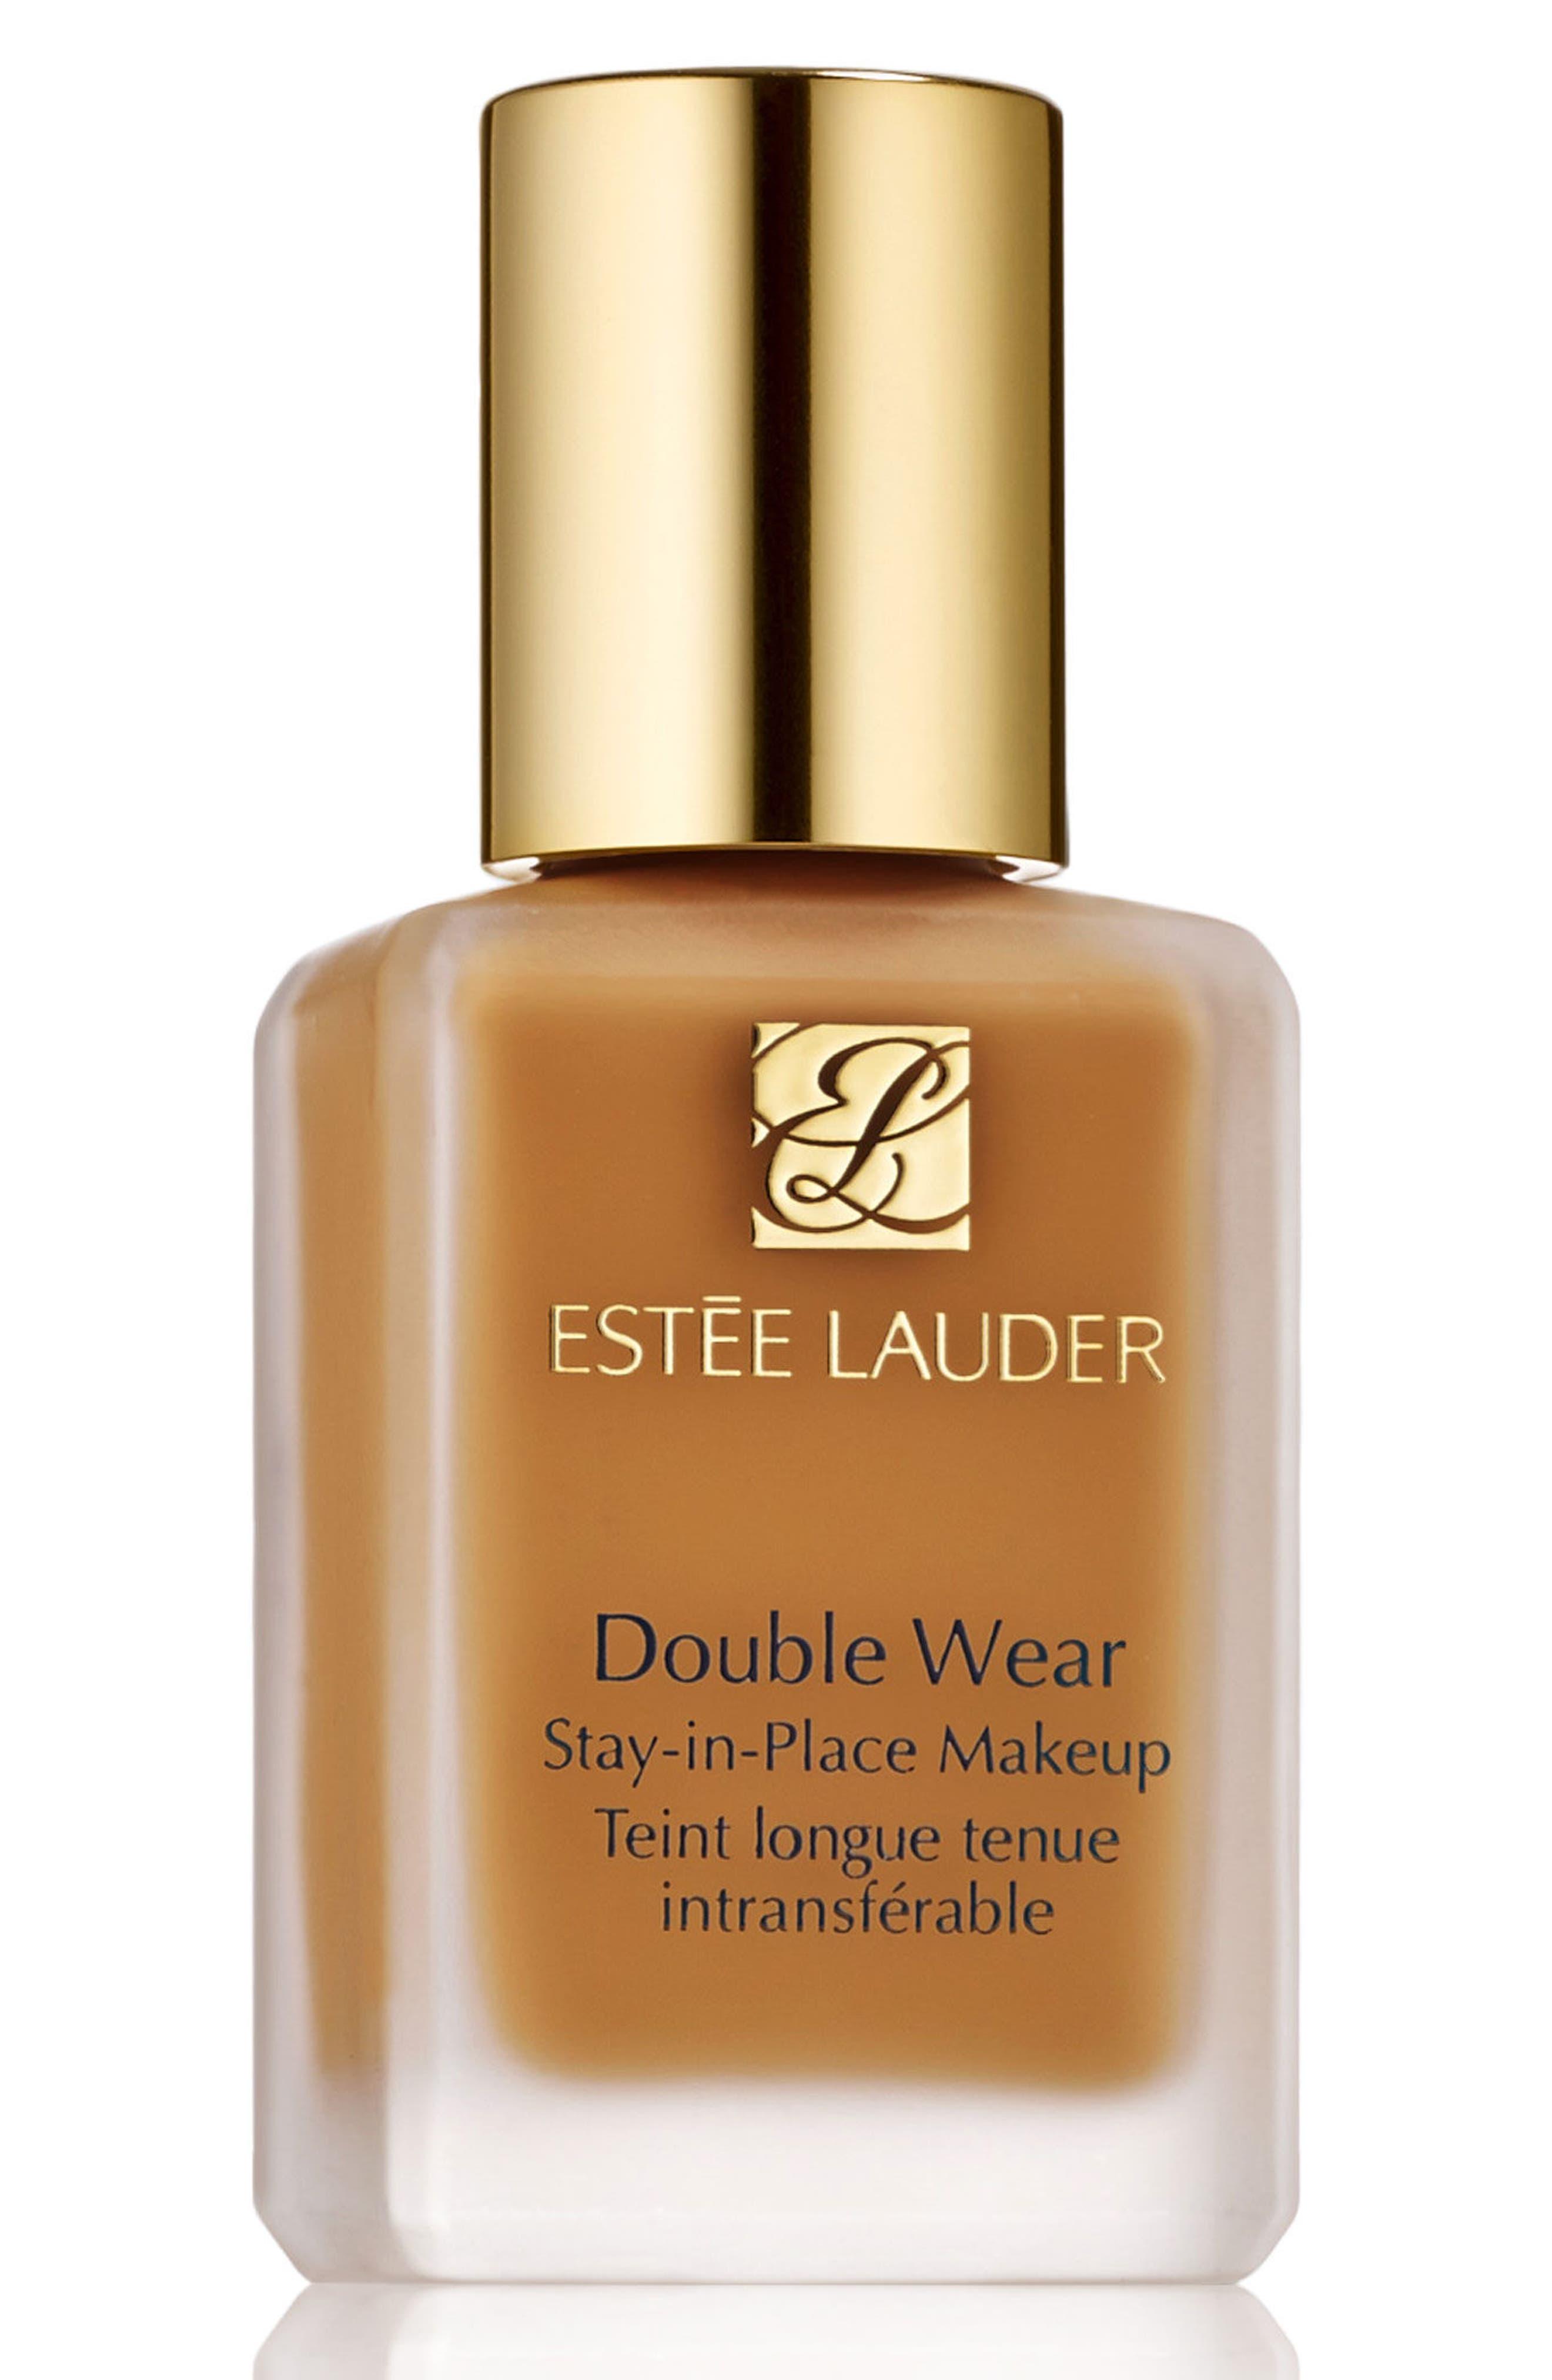 Estee Lauder Double Wear Stay-In-Place Liquid Makeup - 3 Henna